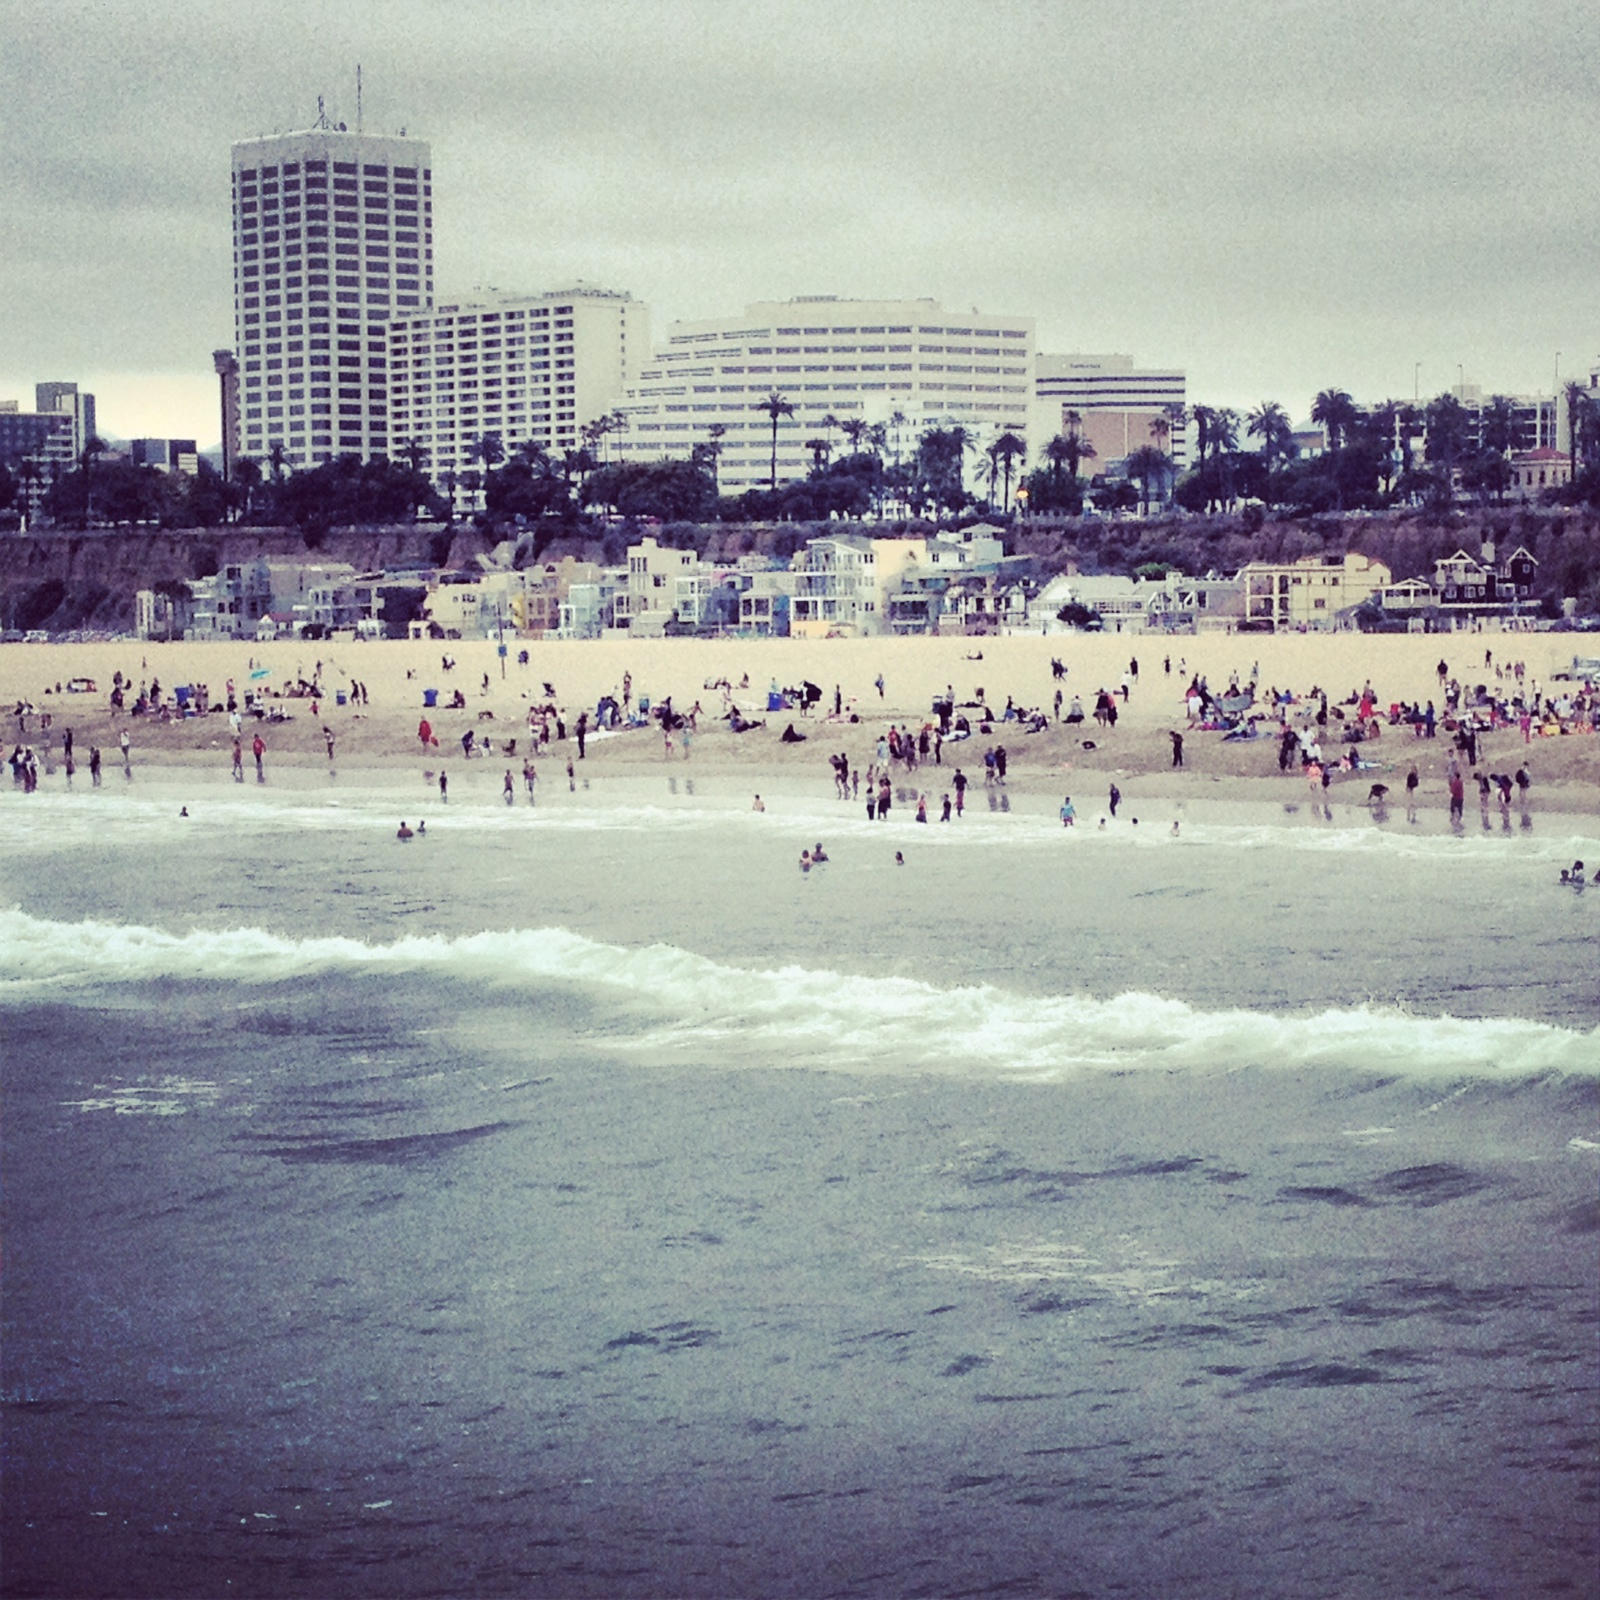 crowded beach.JPG